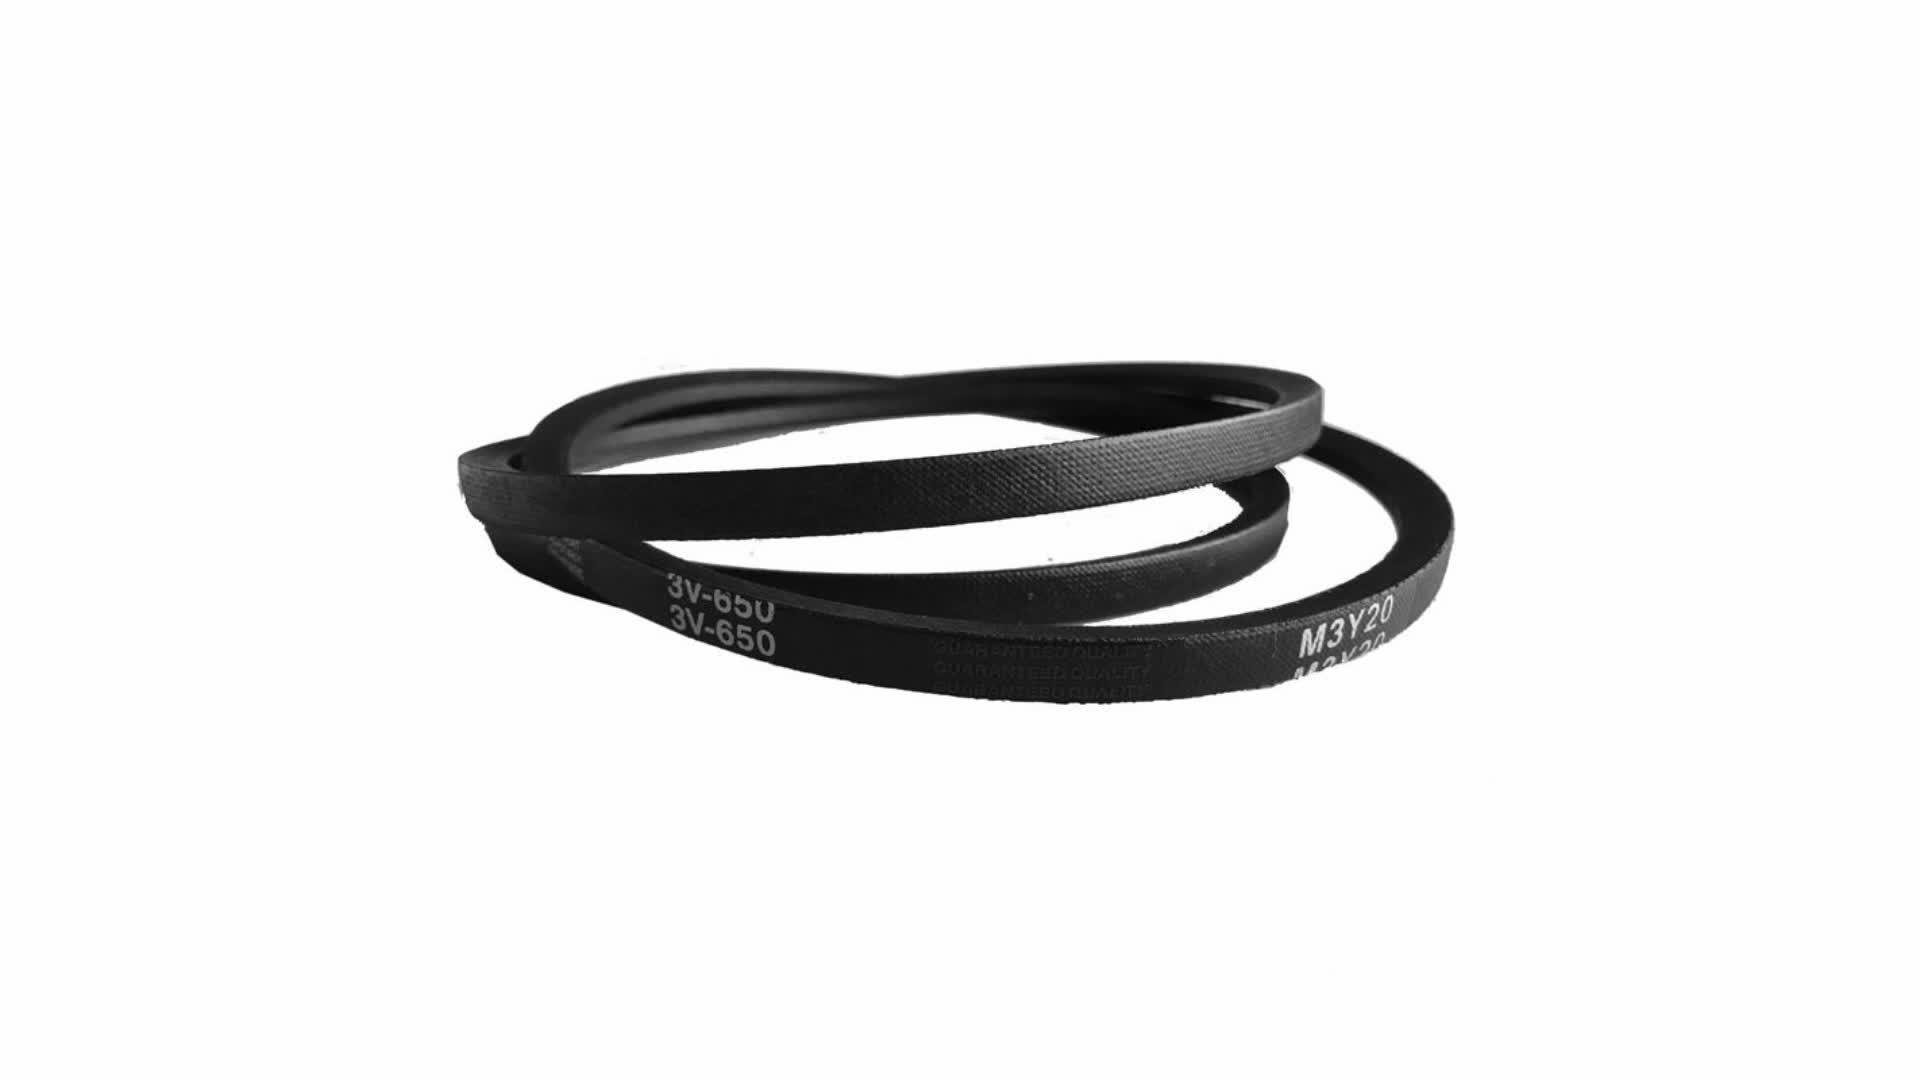 lawn mower wedge standard wrapped rubber V belt